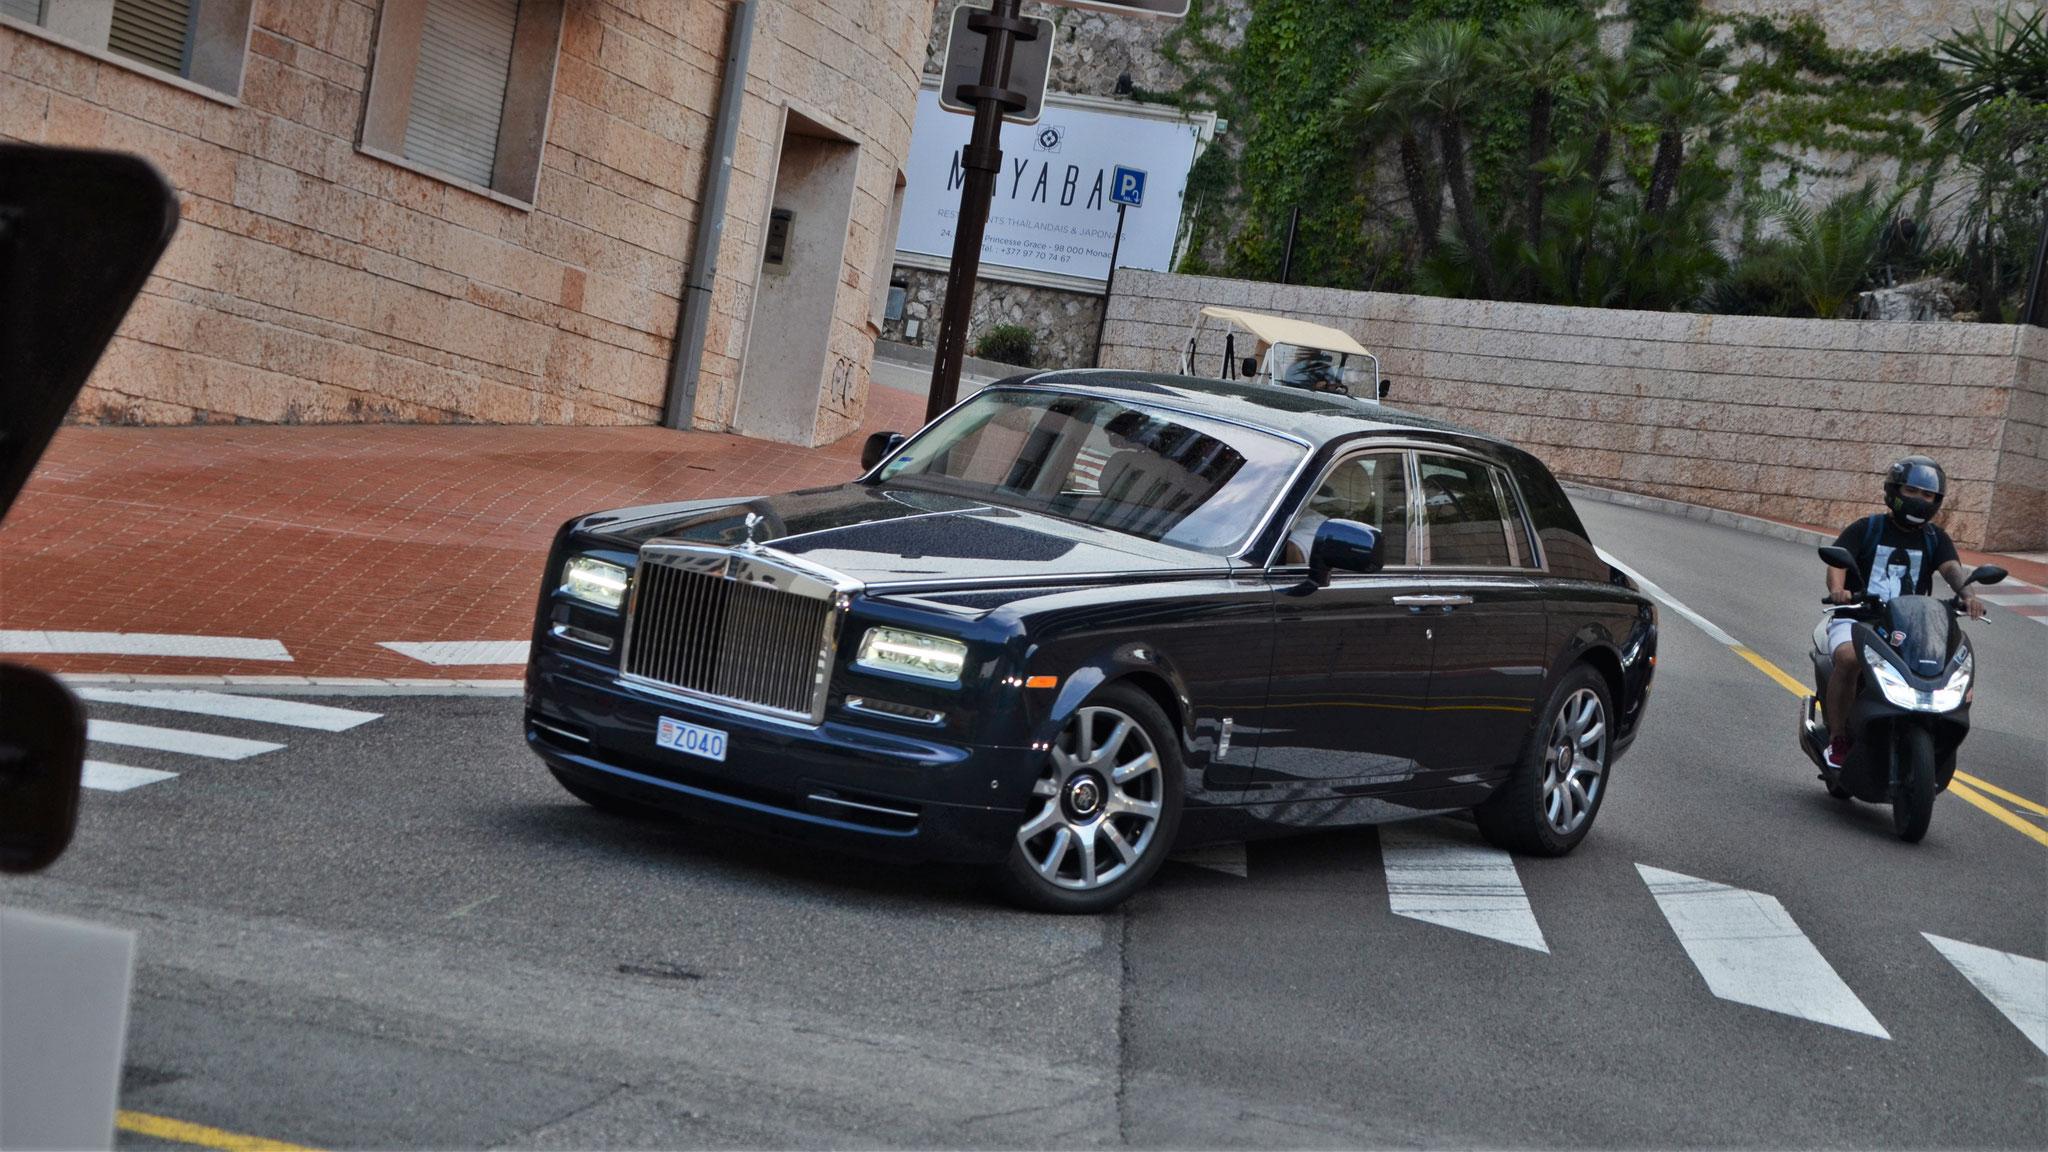 Rolls Royce Phantom - Z040 (MC)